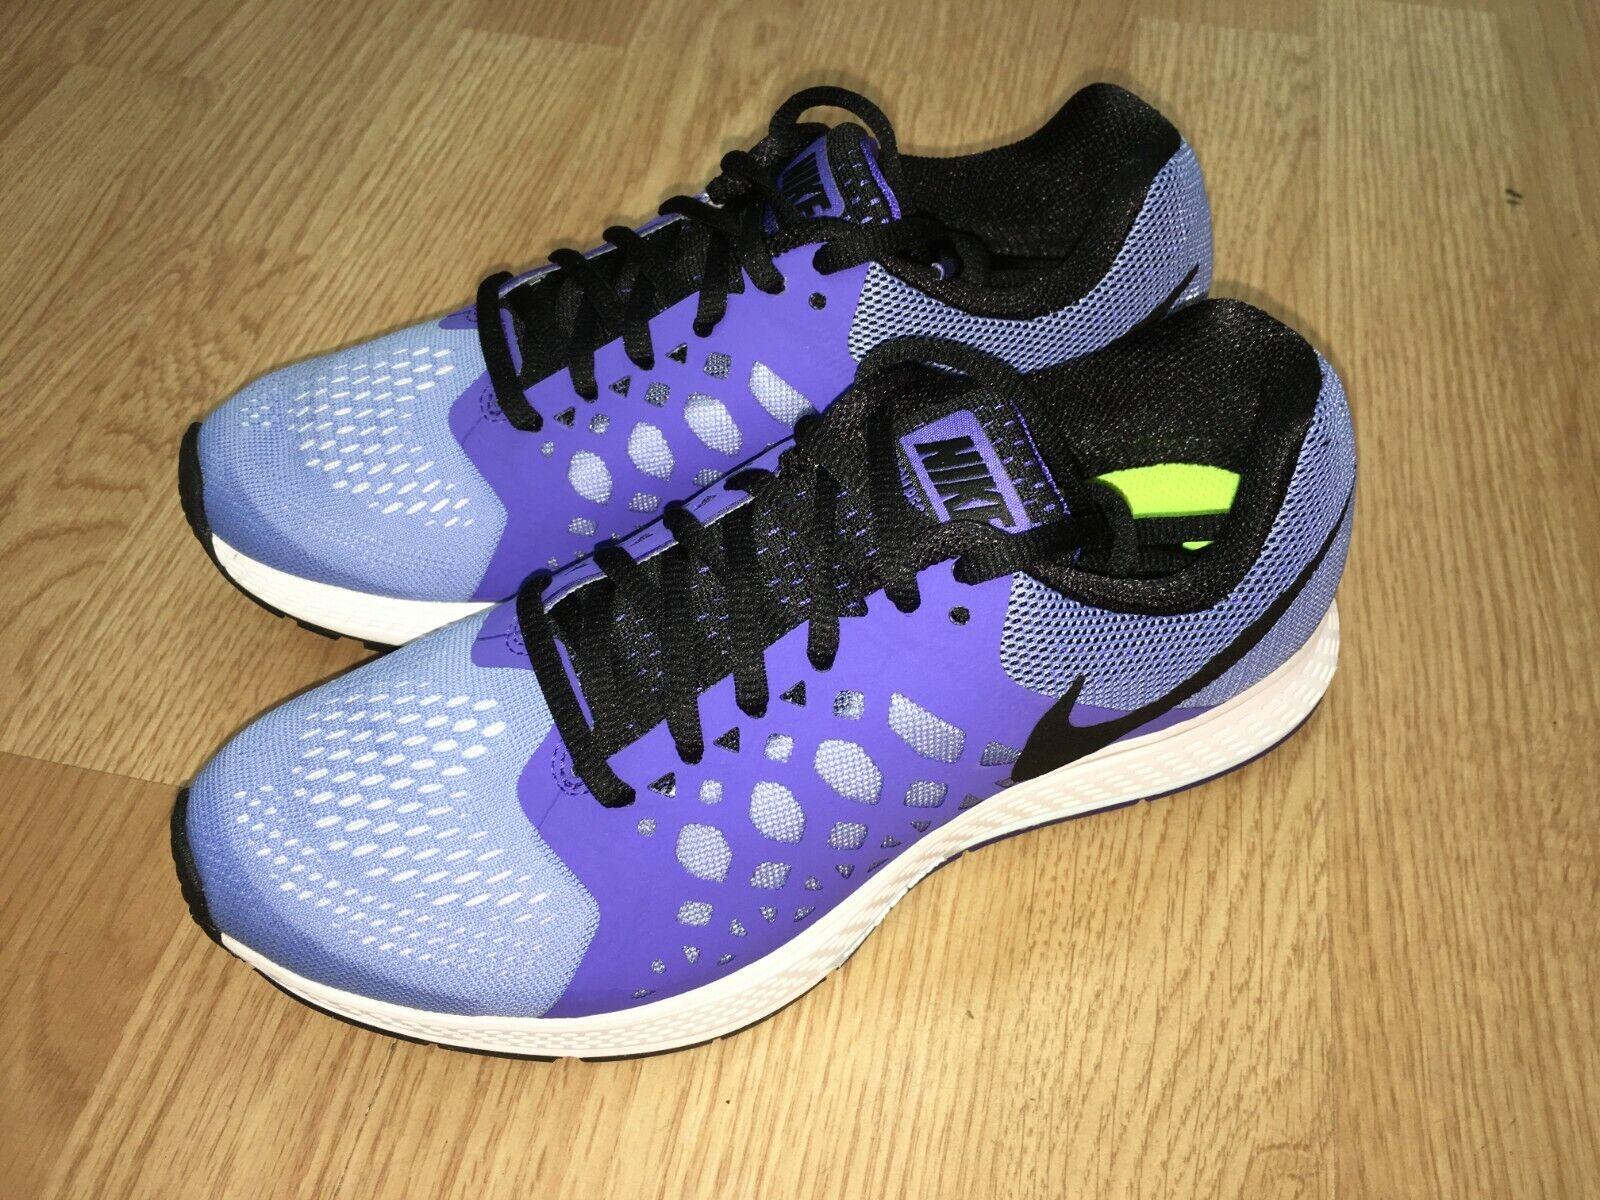 3c5079207bee ... Nike Air Zoom Pegasus 31 Women Running 654486-402 Purple Ice Ice Ice  Polar Black ...